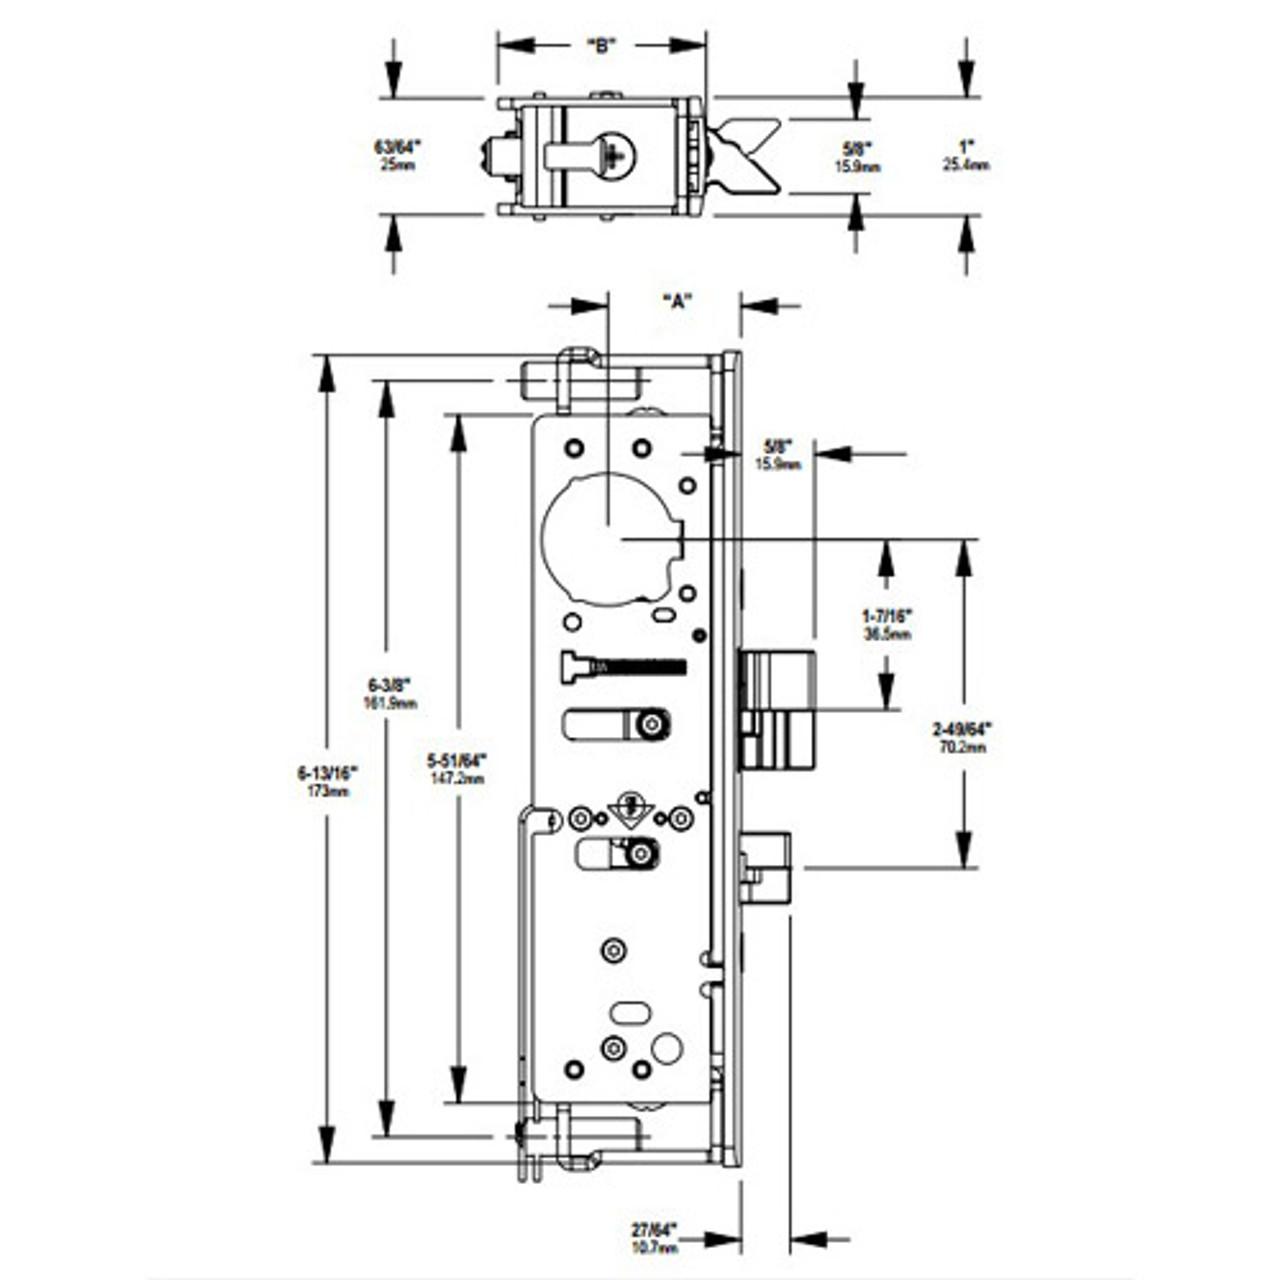 4300-4M-101-313 Adams Rite Electrified Deadlatch Dimensional View